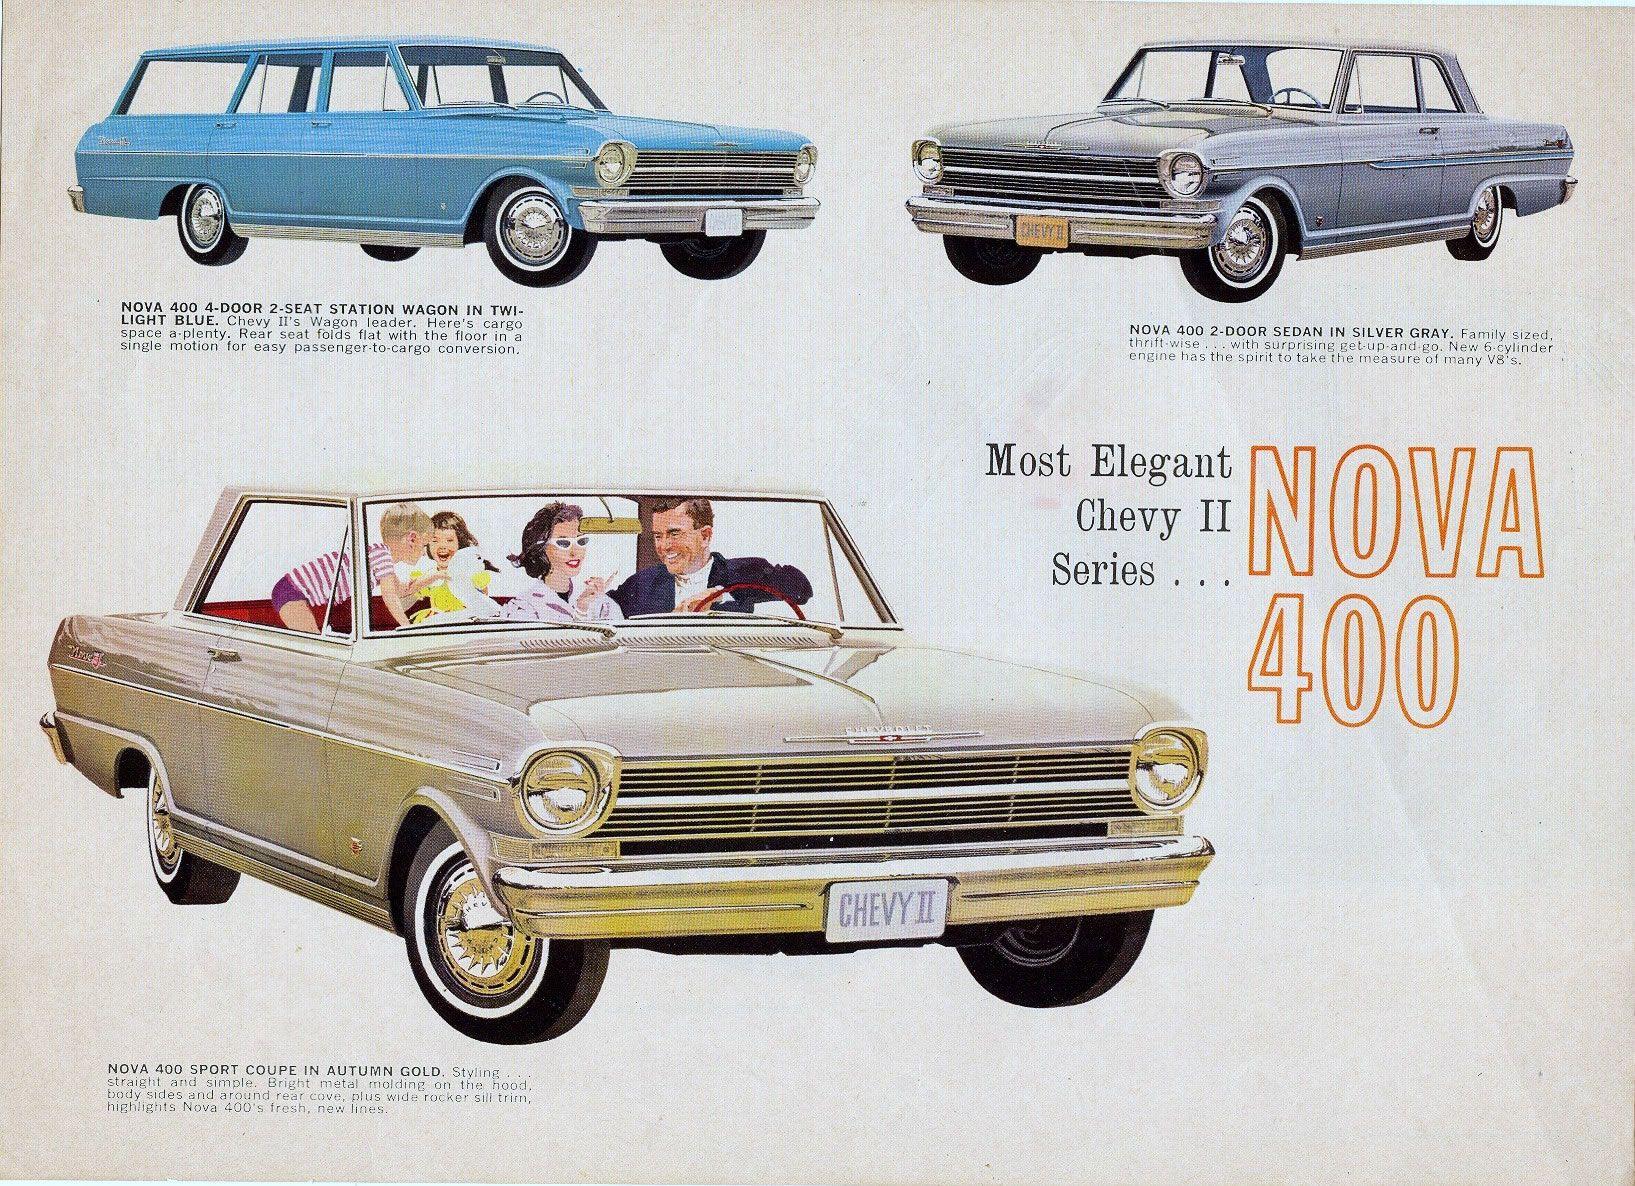 62 Hood Emblems Chevy Nova Forum Chevy Chevy Nova Car Advertising